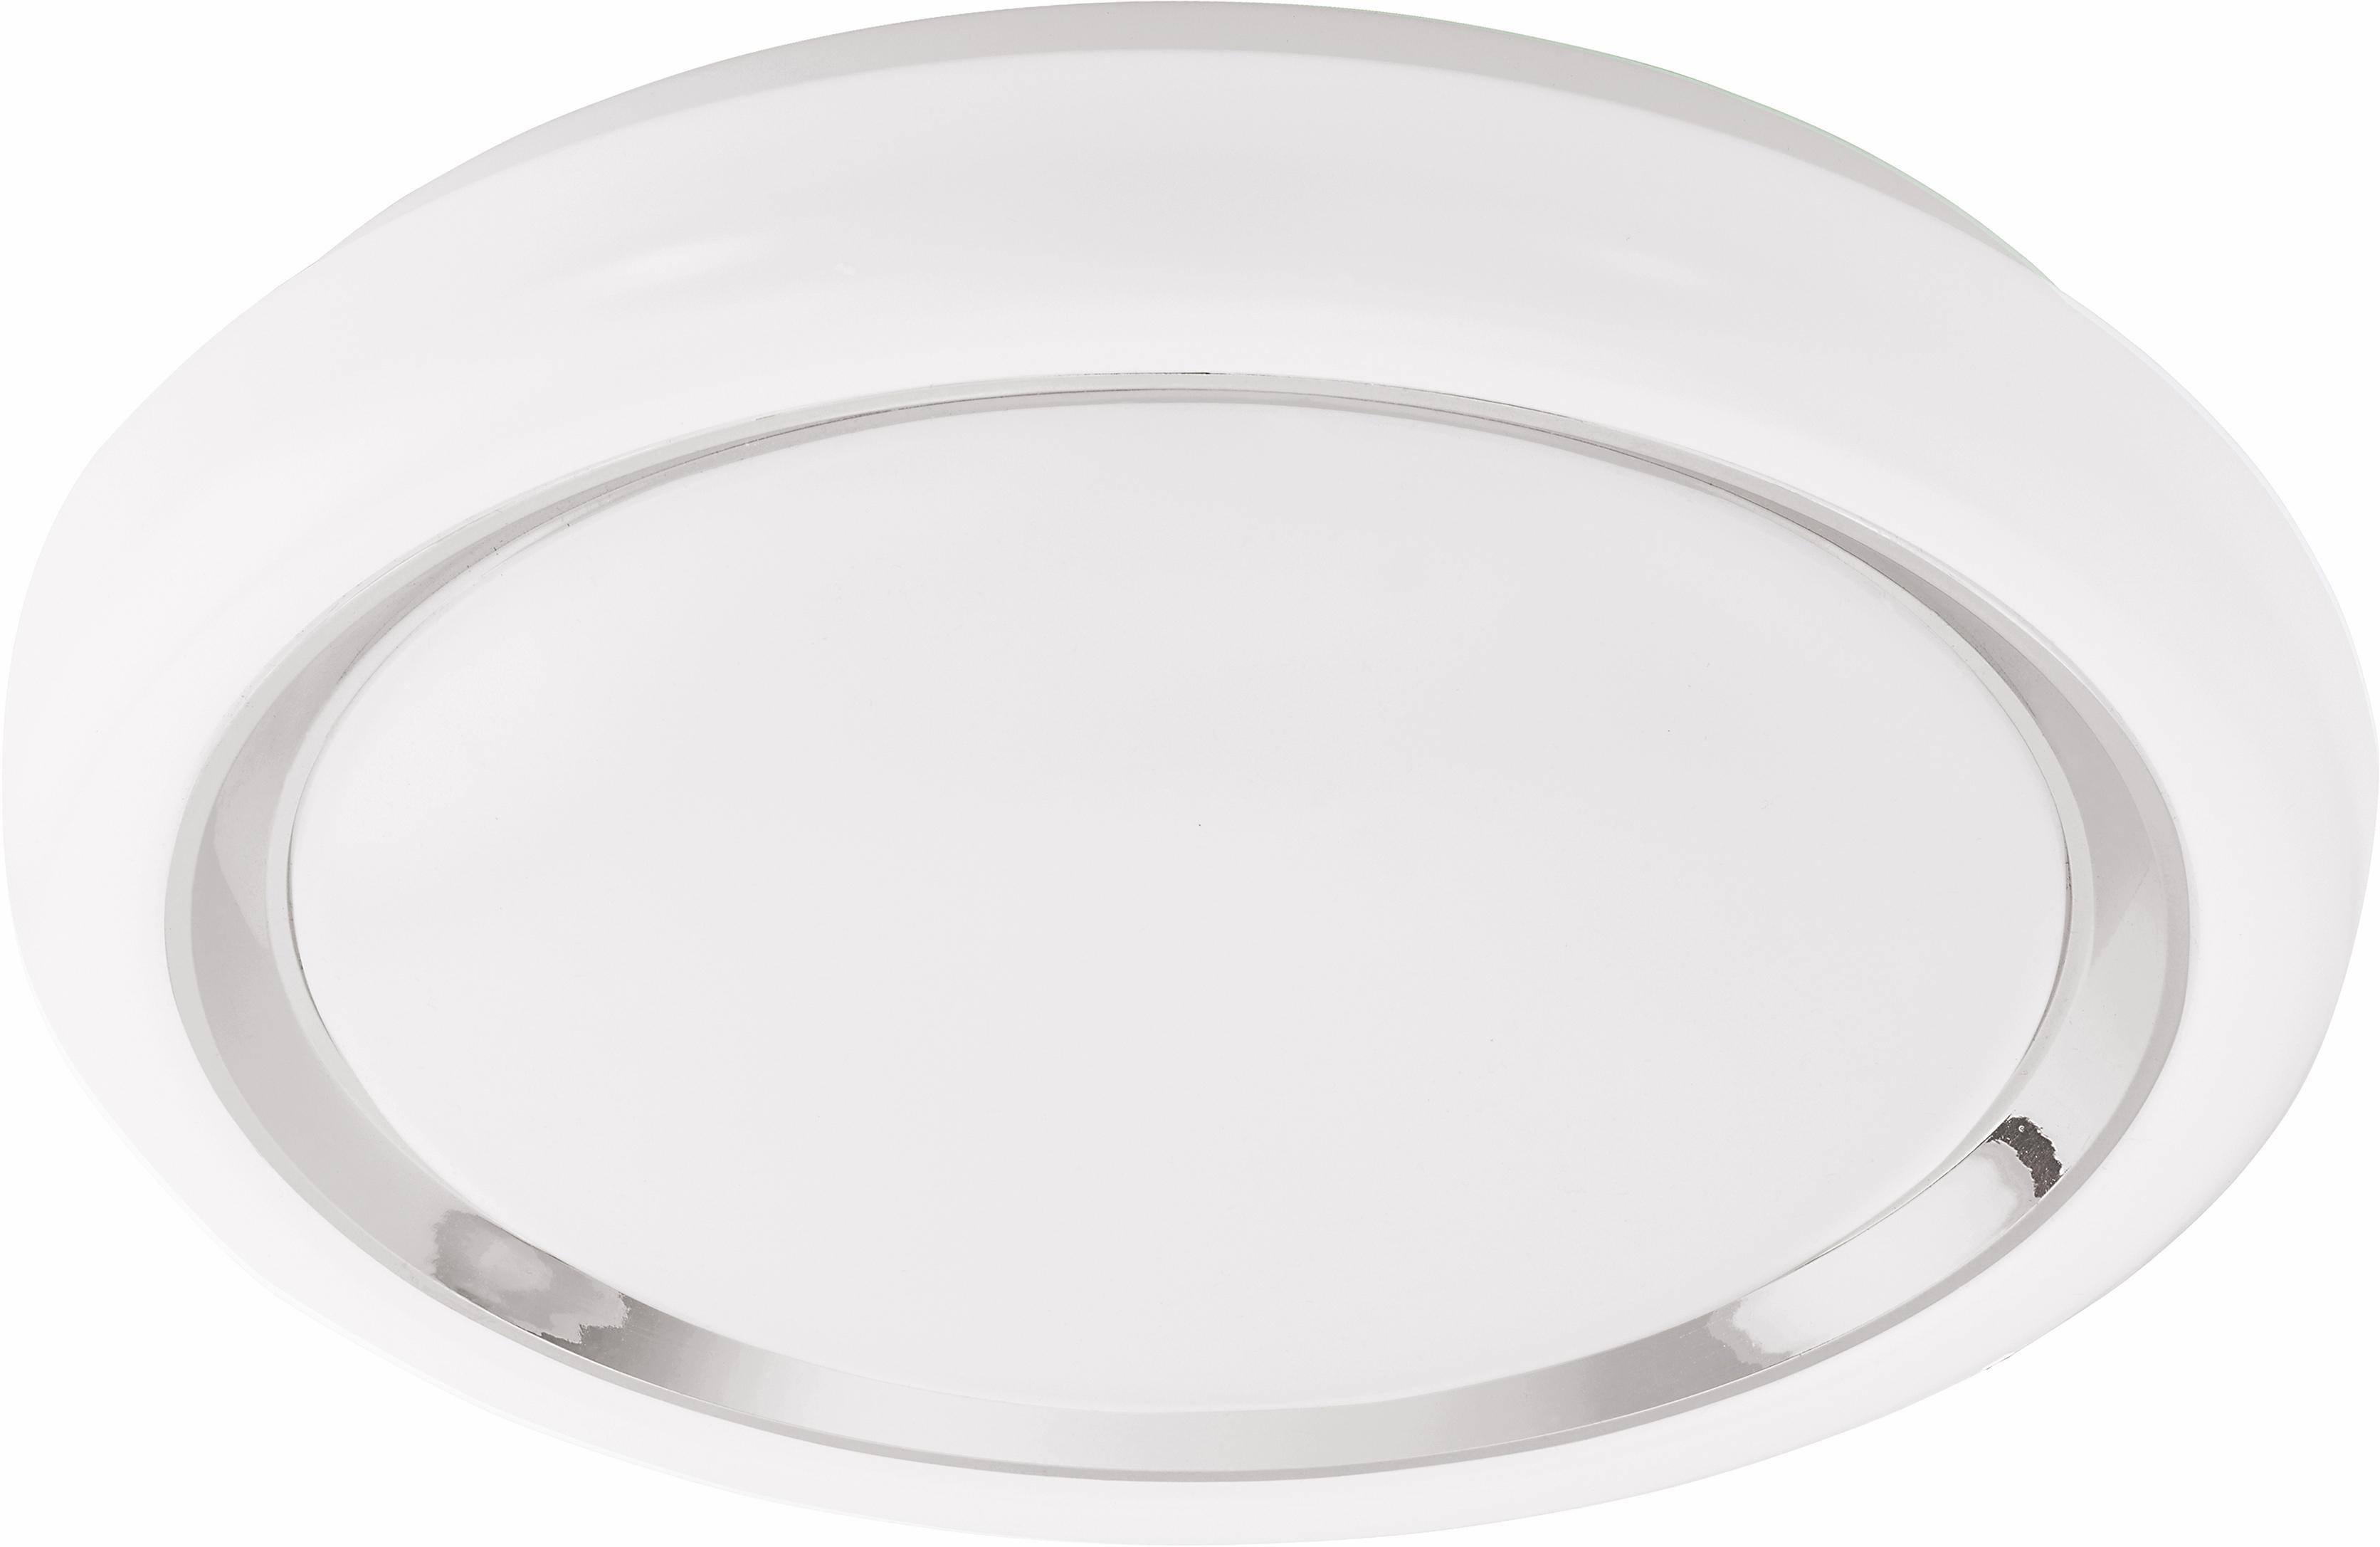 EGLO,LED Deckenleuchte CAPASSO-C